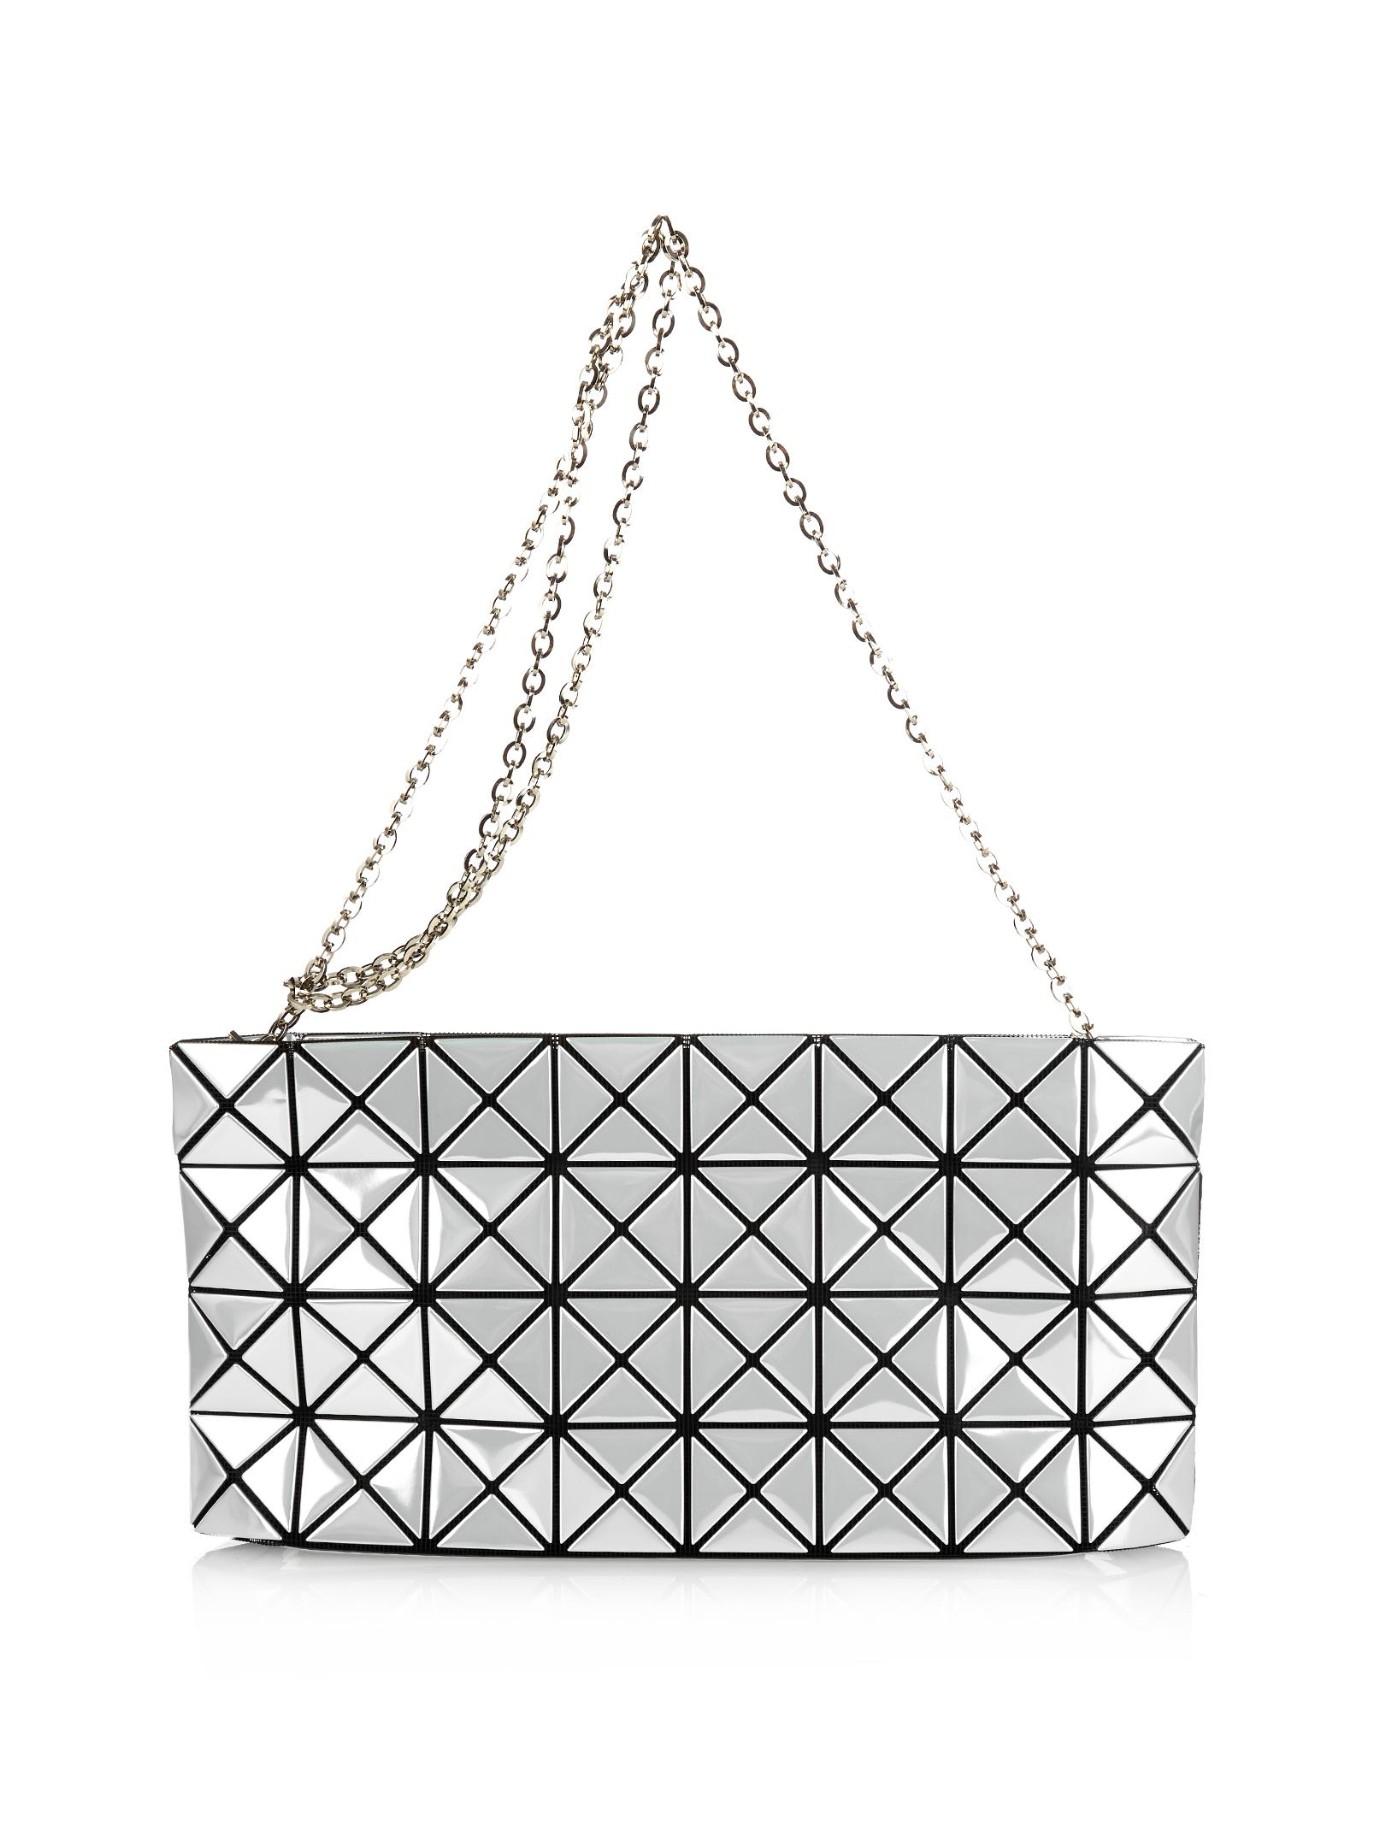 2b84f60de1c2 Lyst - Bao Bao Issey Miyake Prism Platinum Cross-body Bag in White